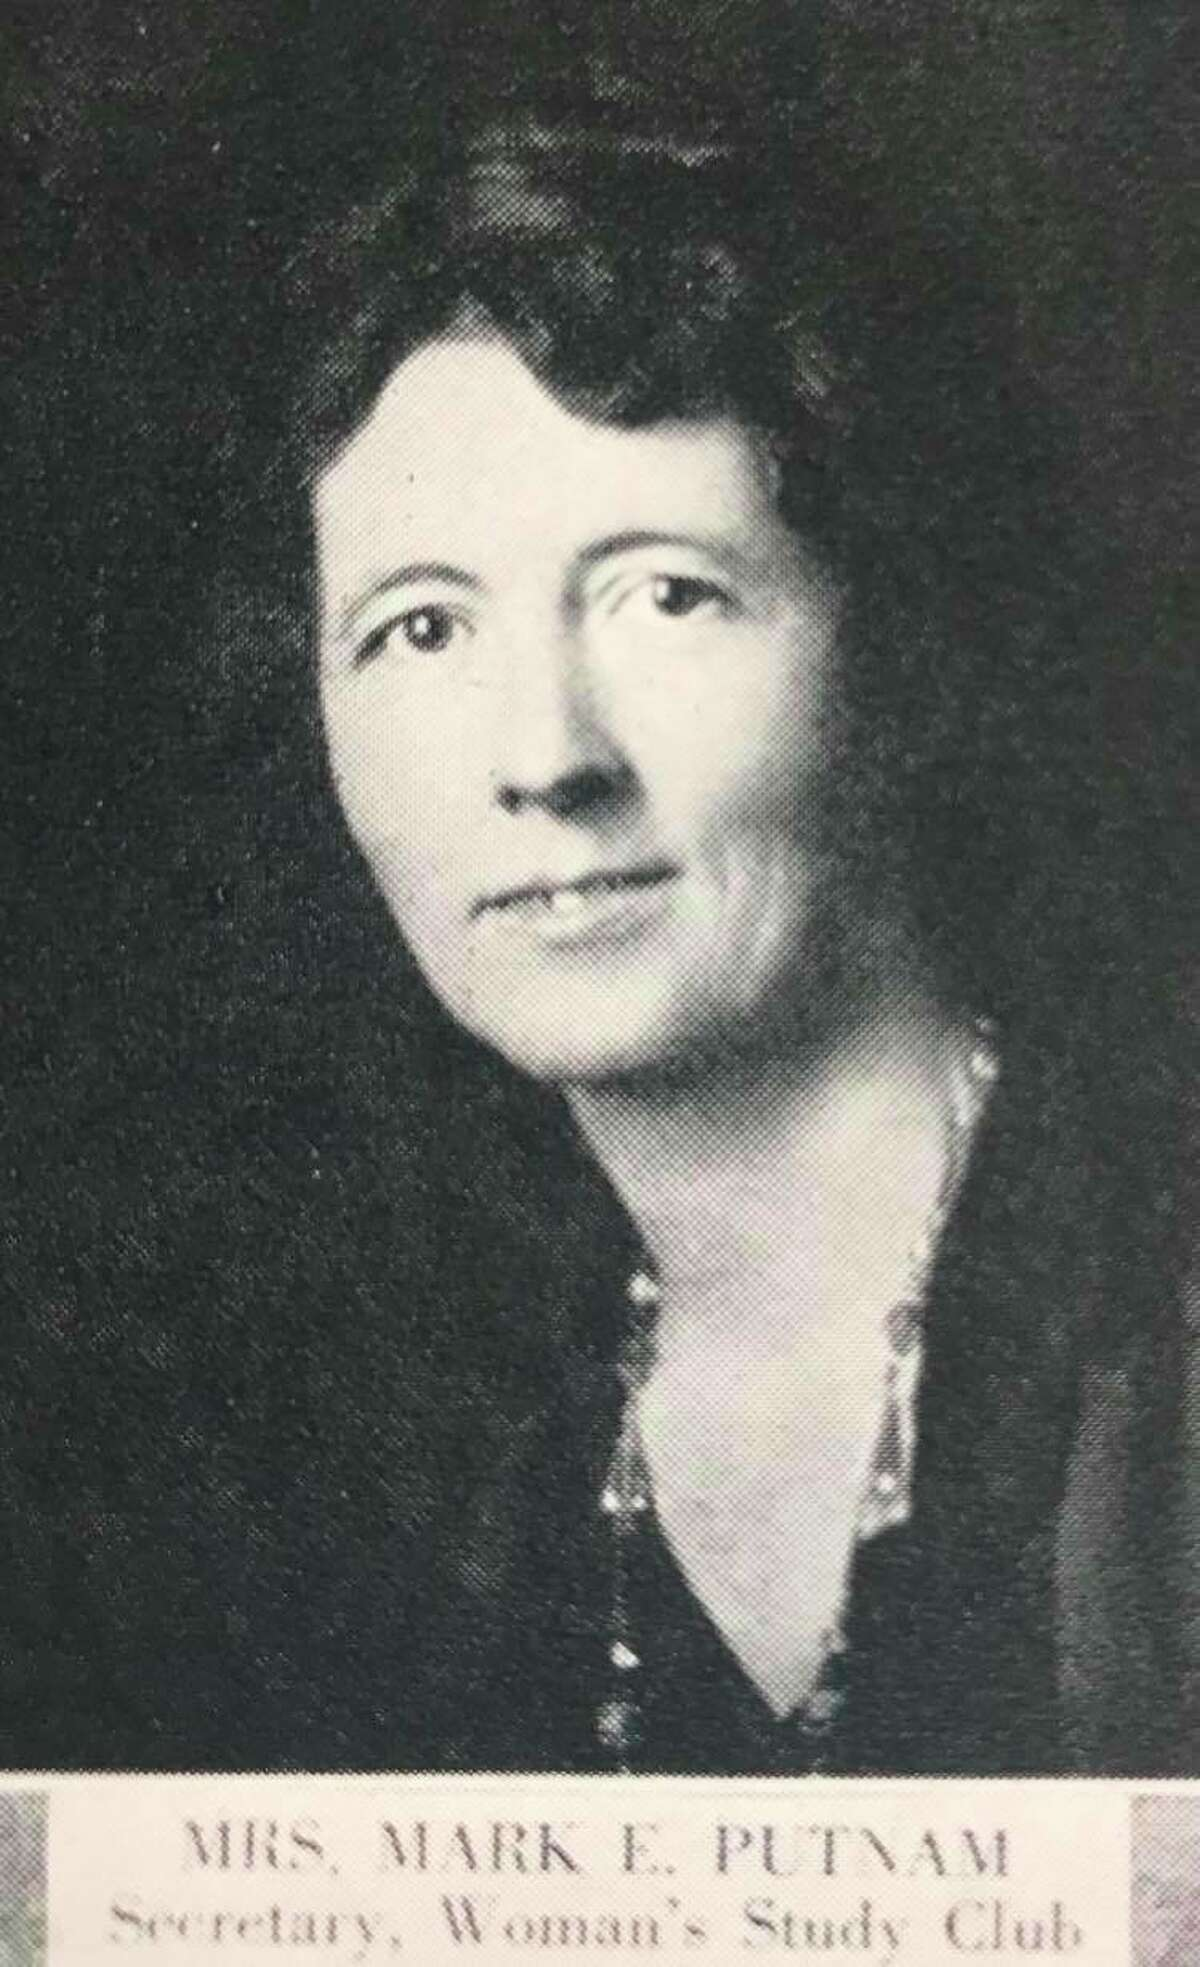 Mrs. Mark E. Putnam, secretary, Woman's Study Club